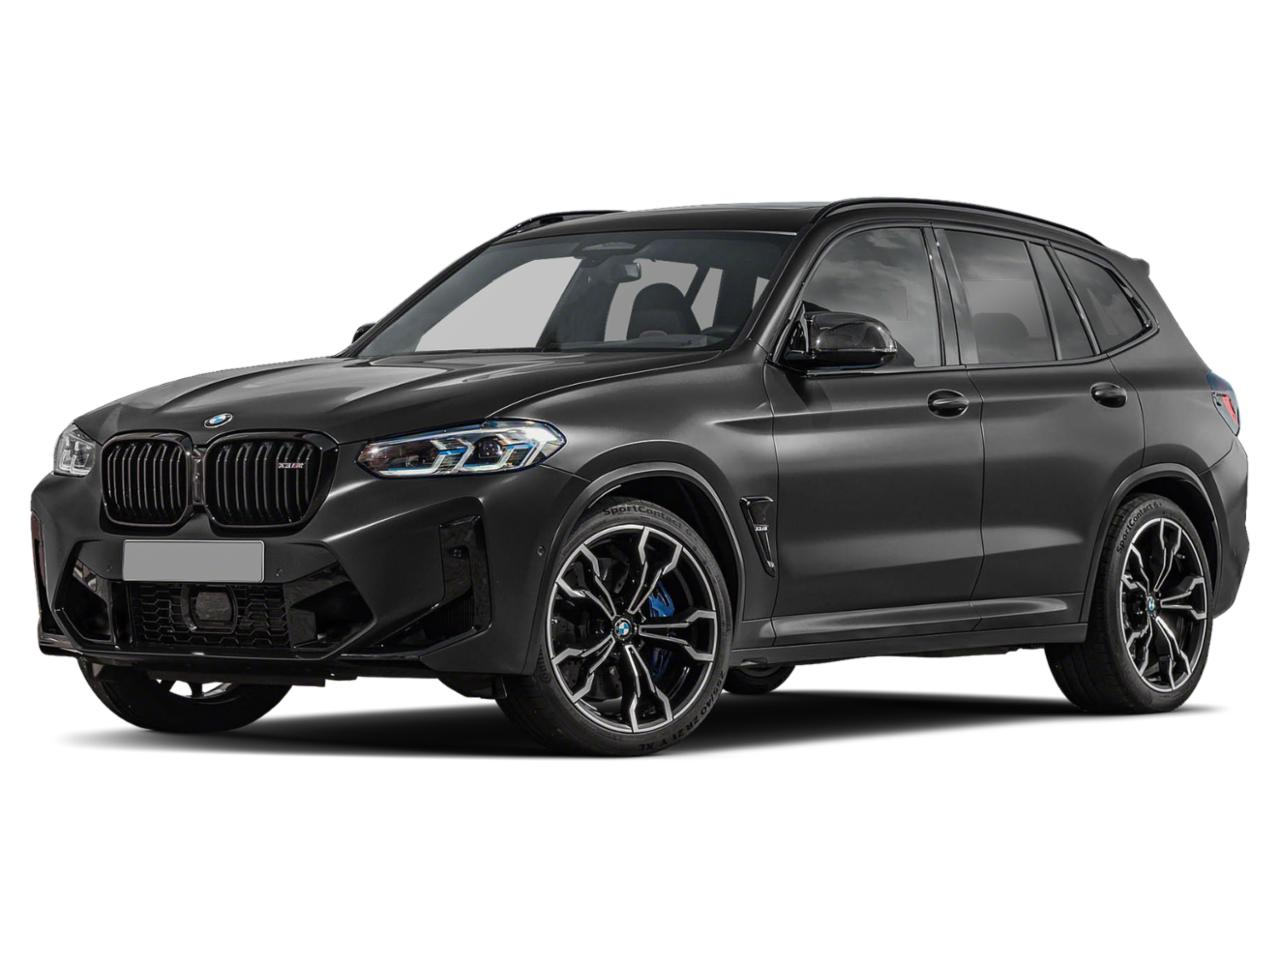 2022 BMW X3 M Vehicle Photo in GRAPEVINE, TX 76051